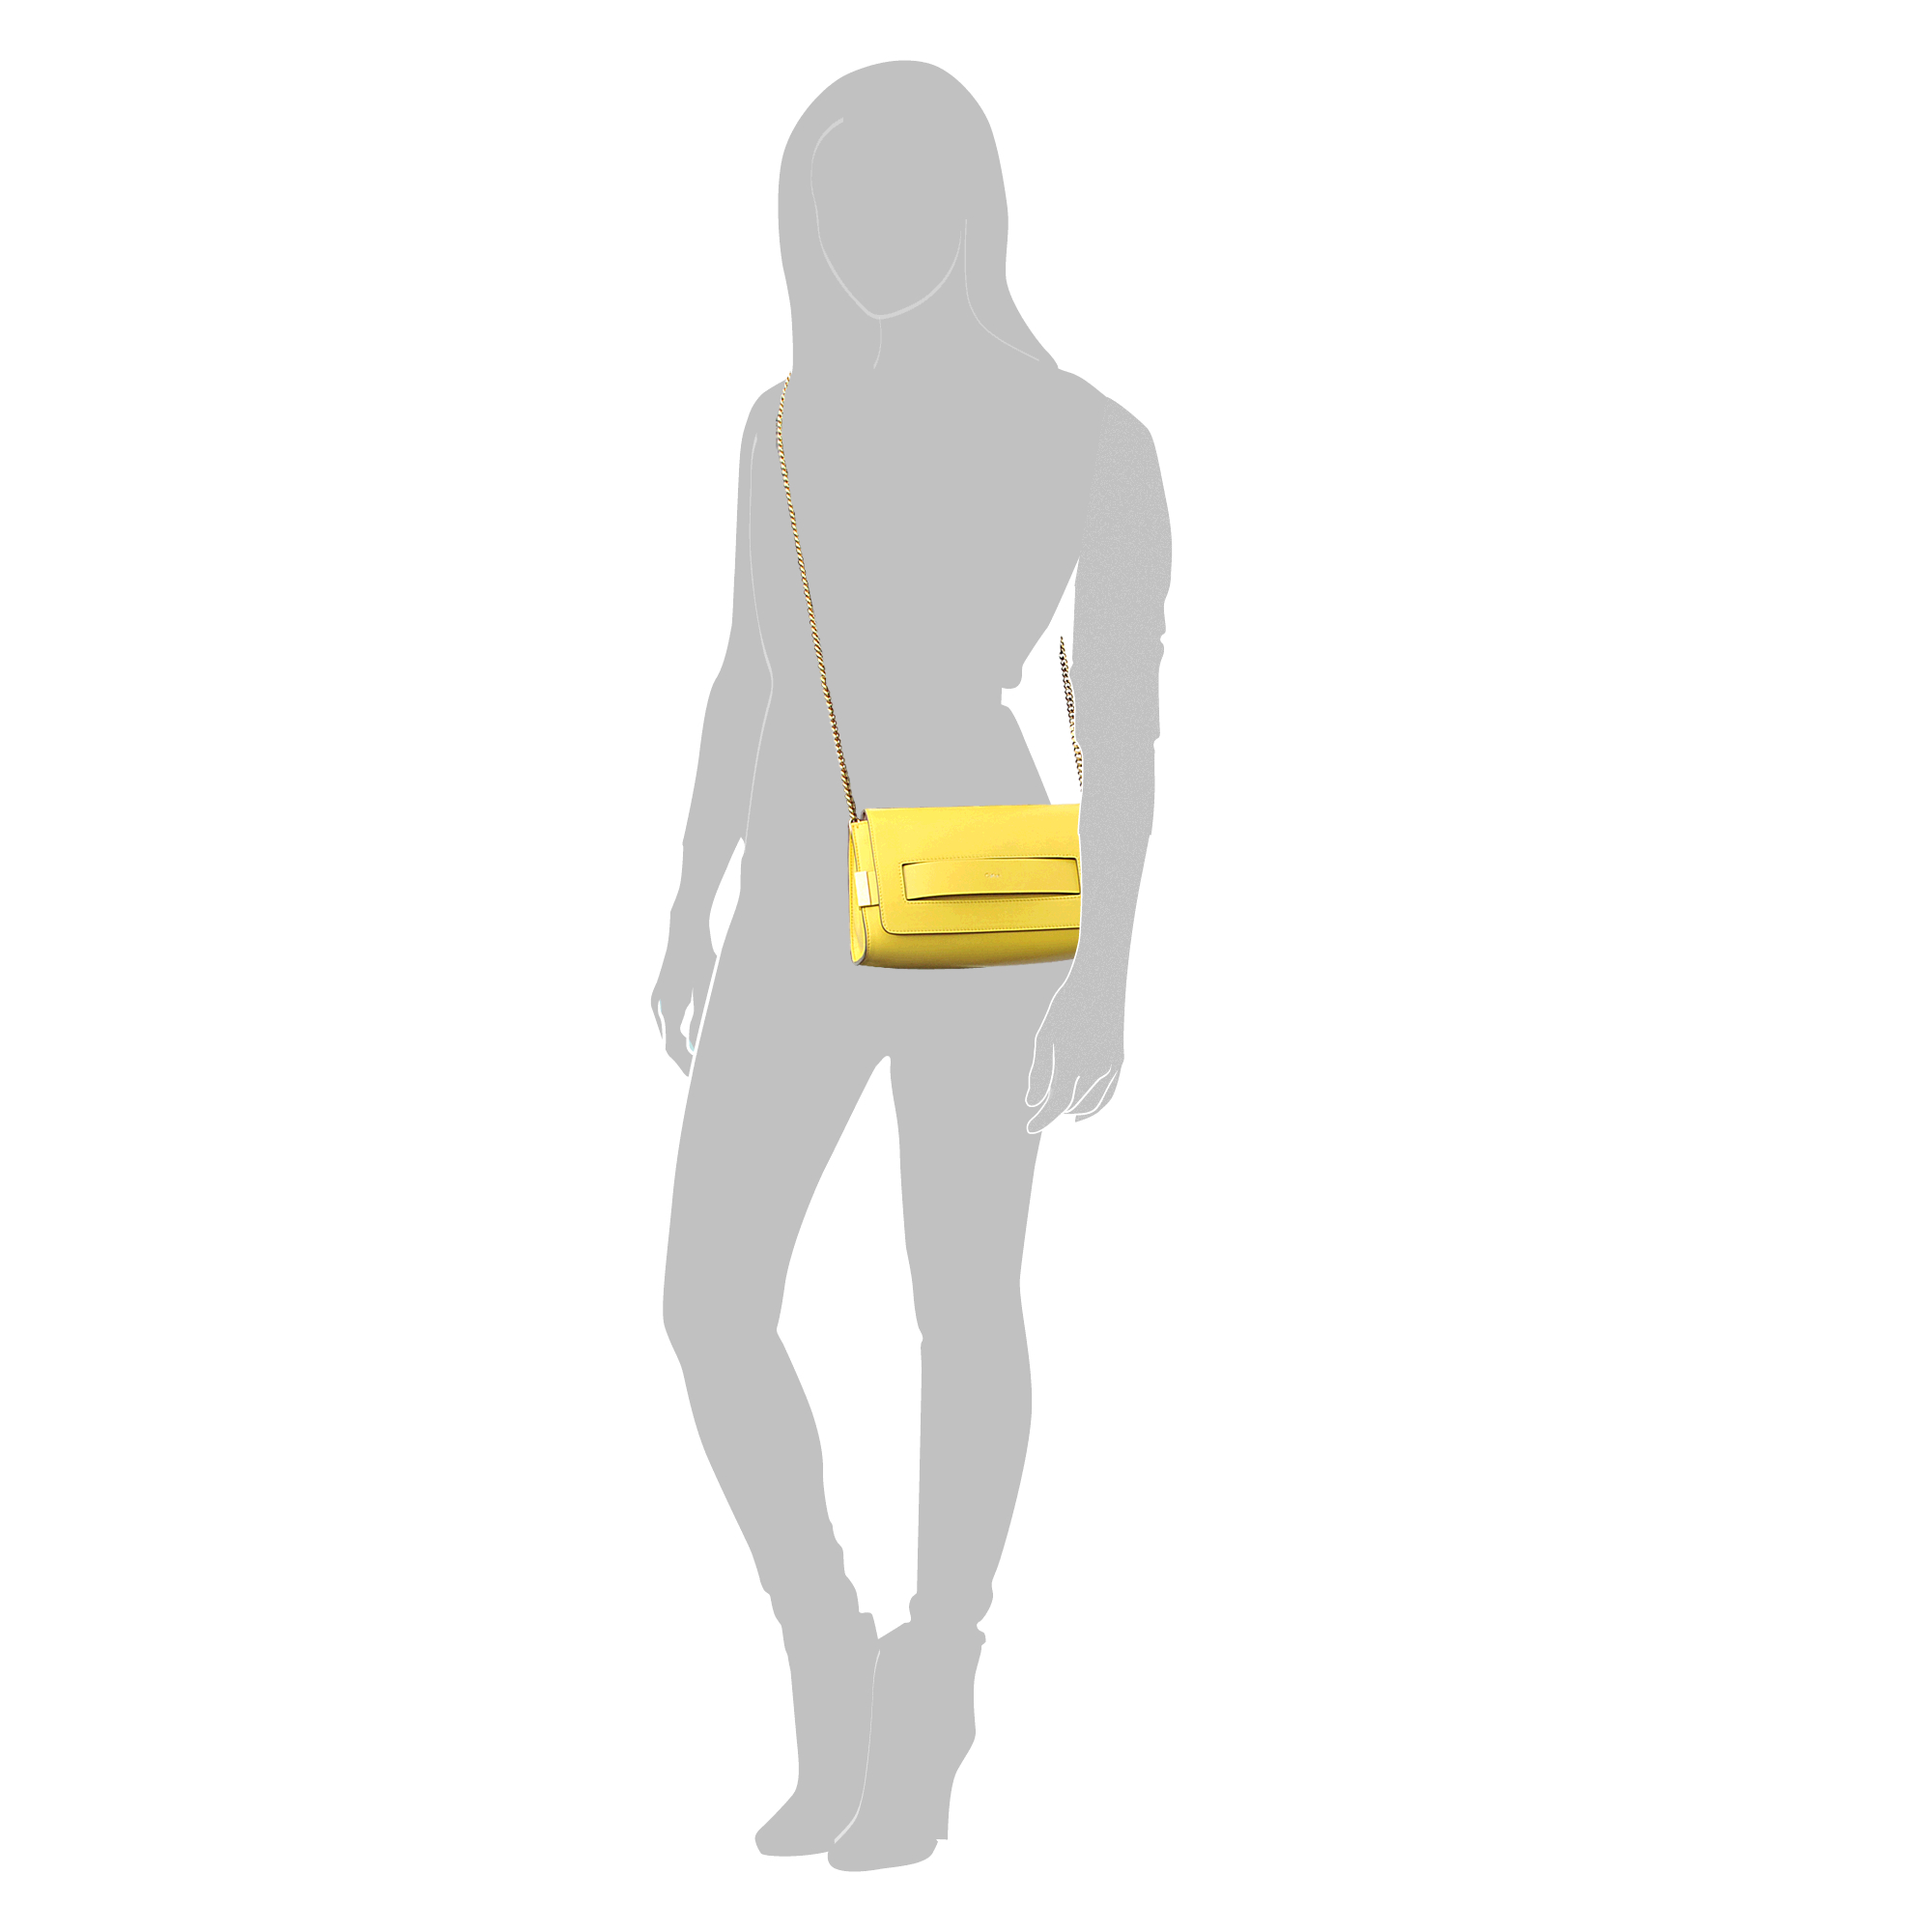 official 2015 chloe fake replica handbags wallet $180